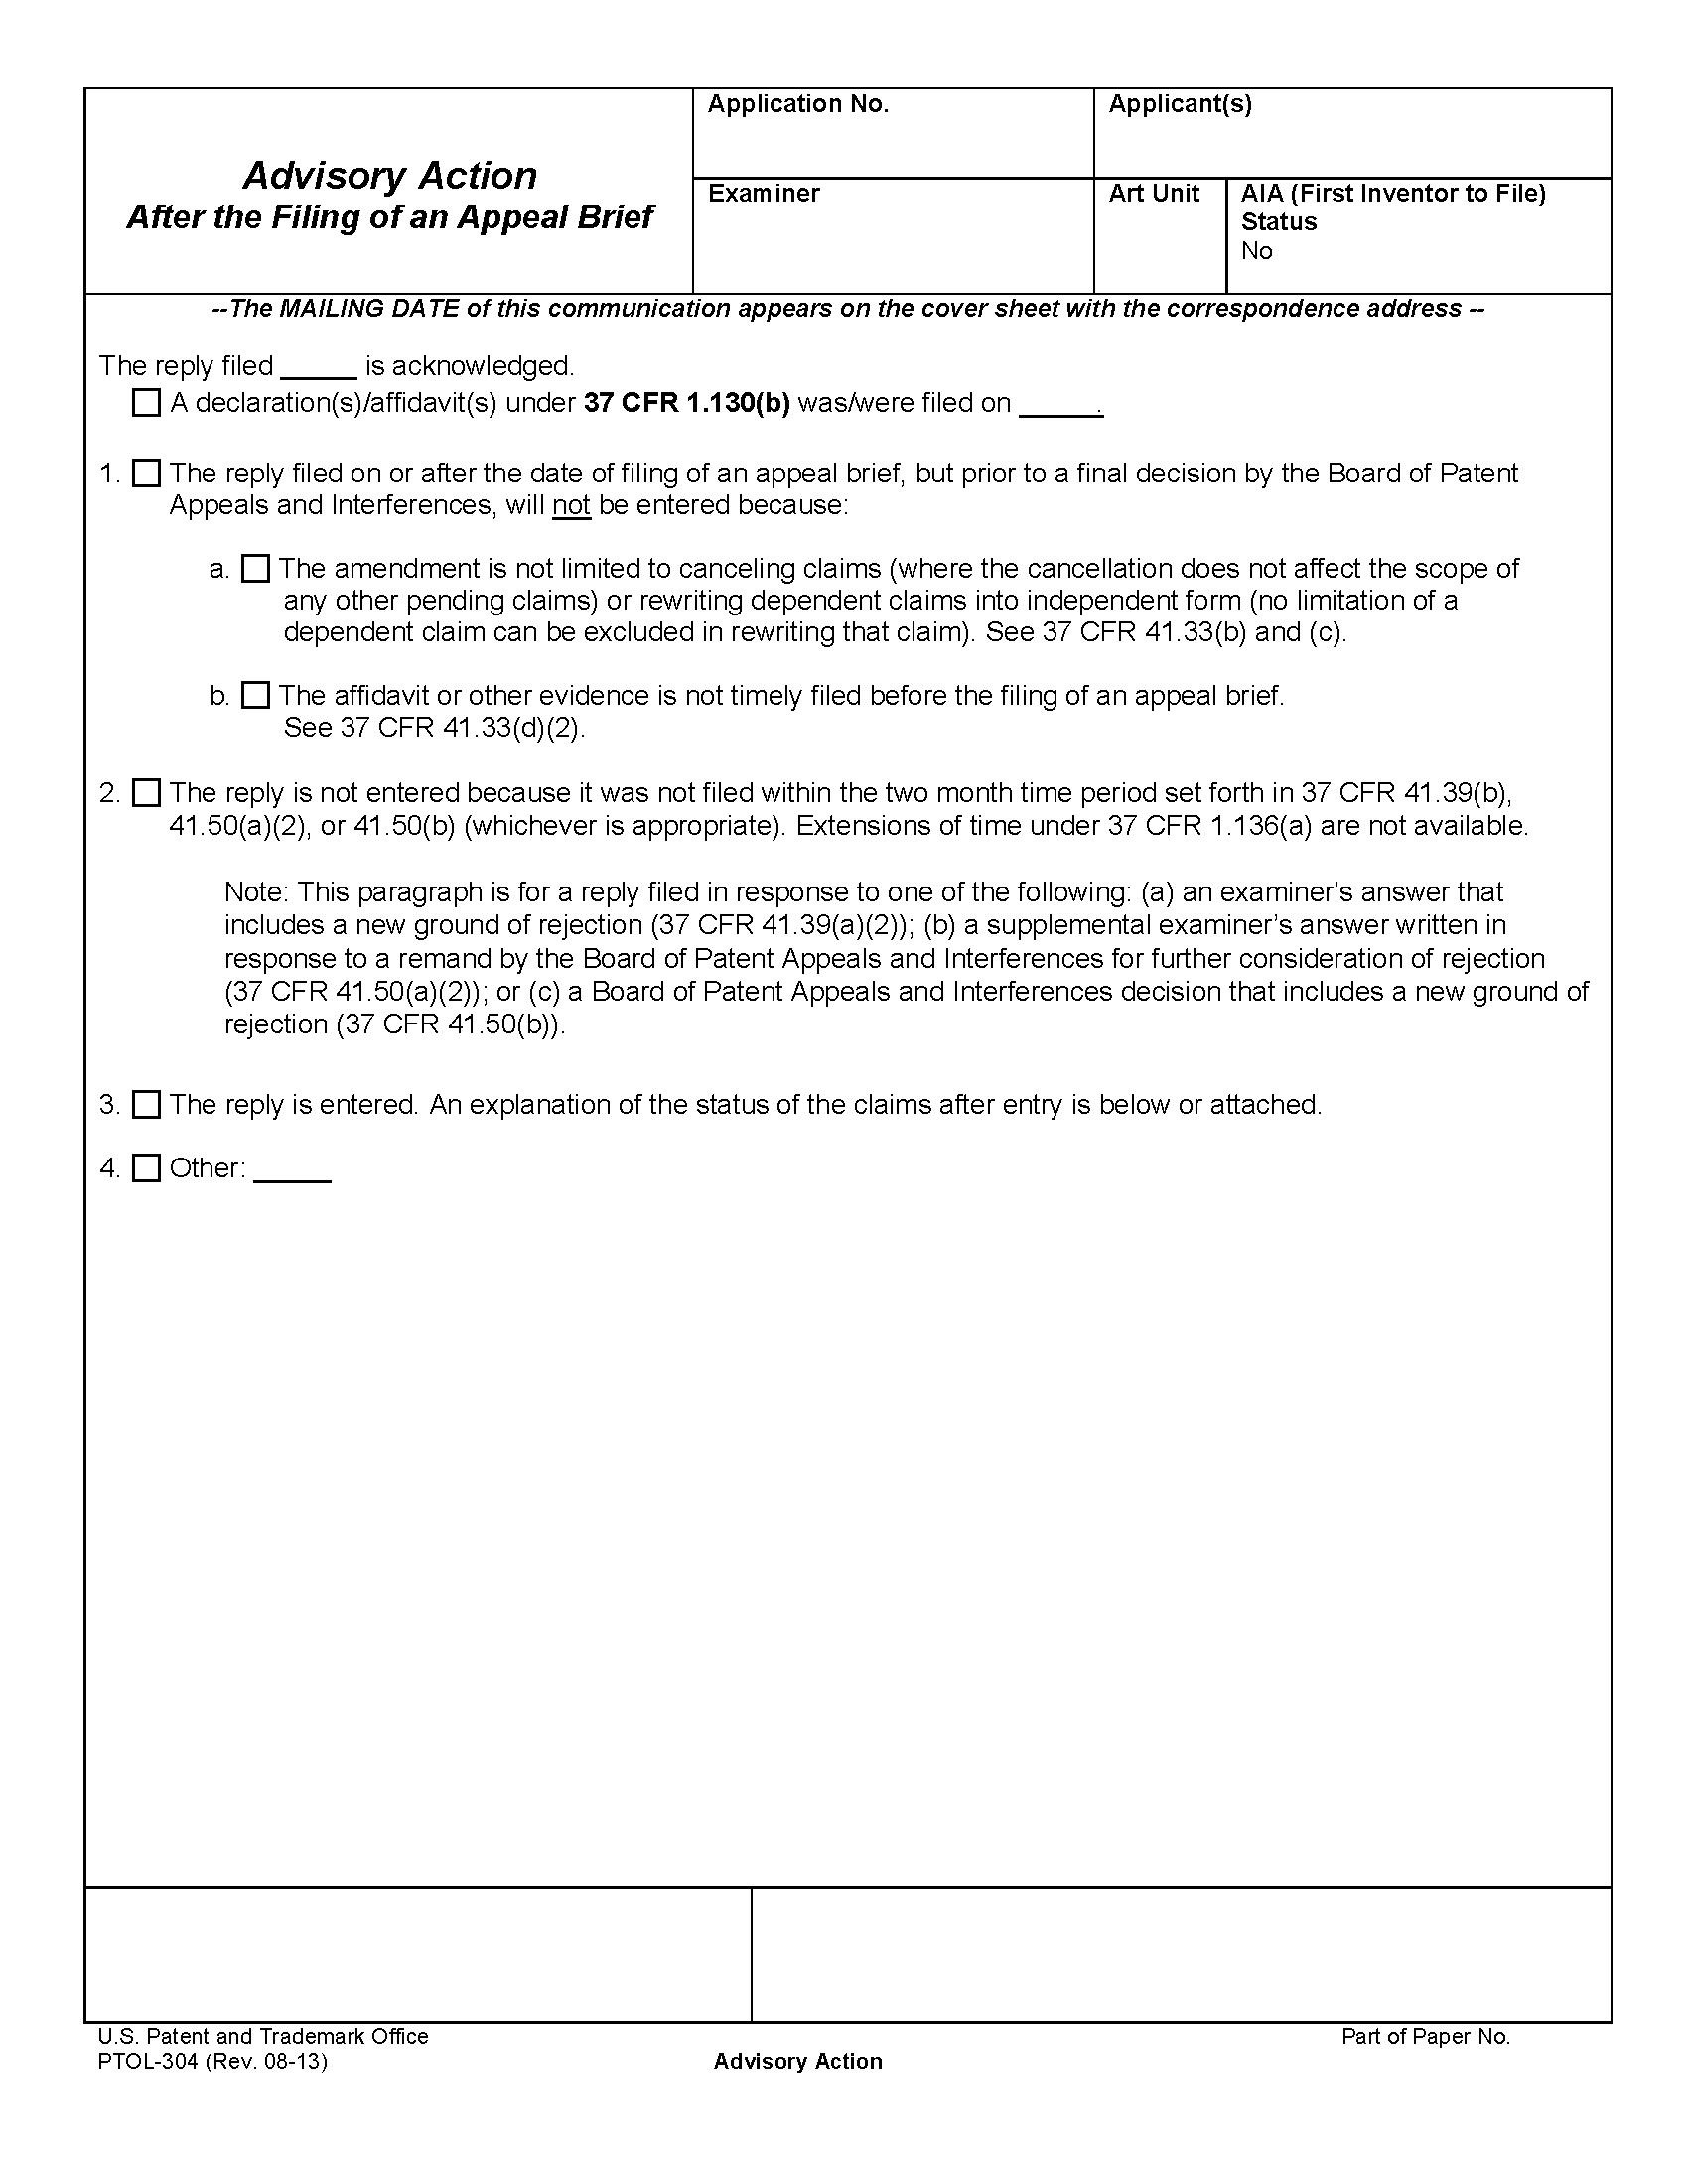 vic gov how to write a bried